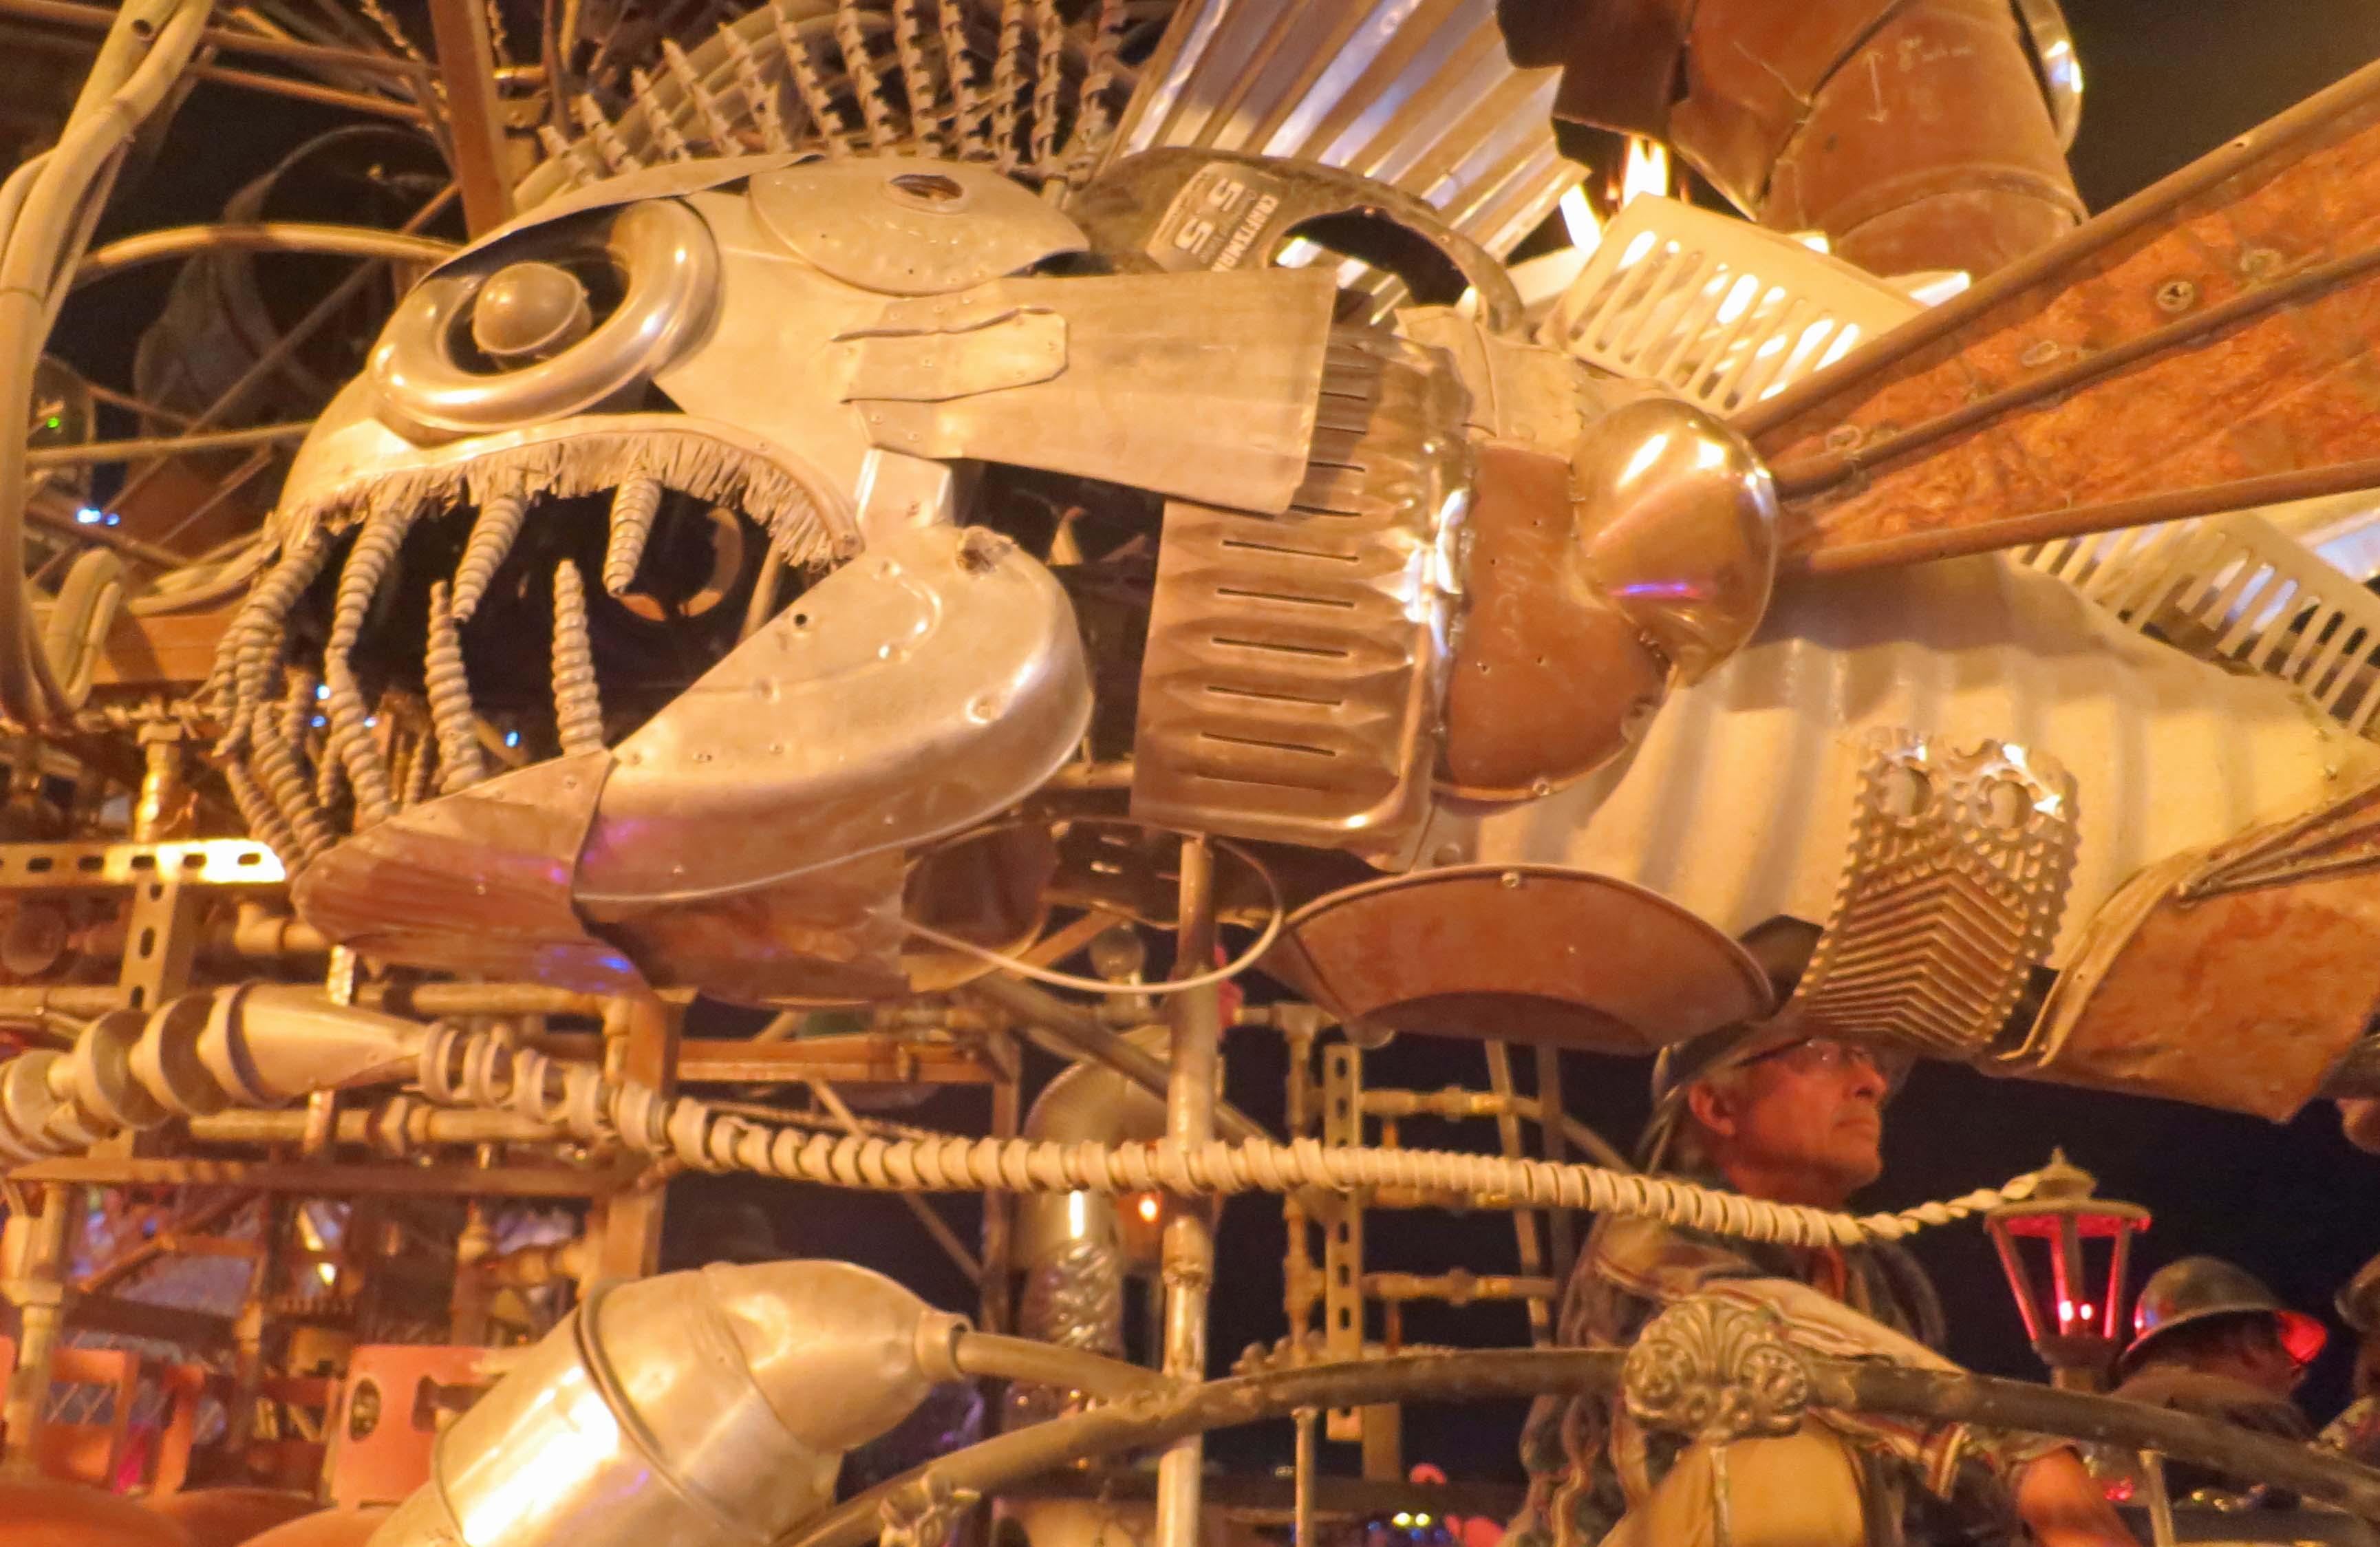 Fish sculpture on side of El Pulpo Mechanico at Burning Man 2013.